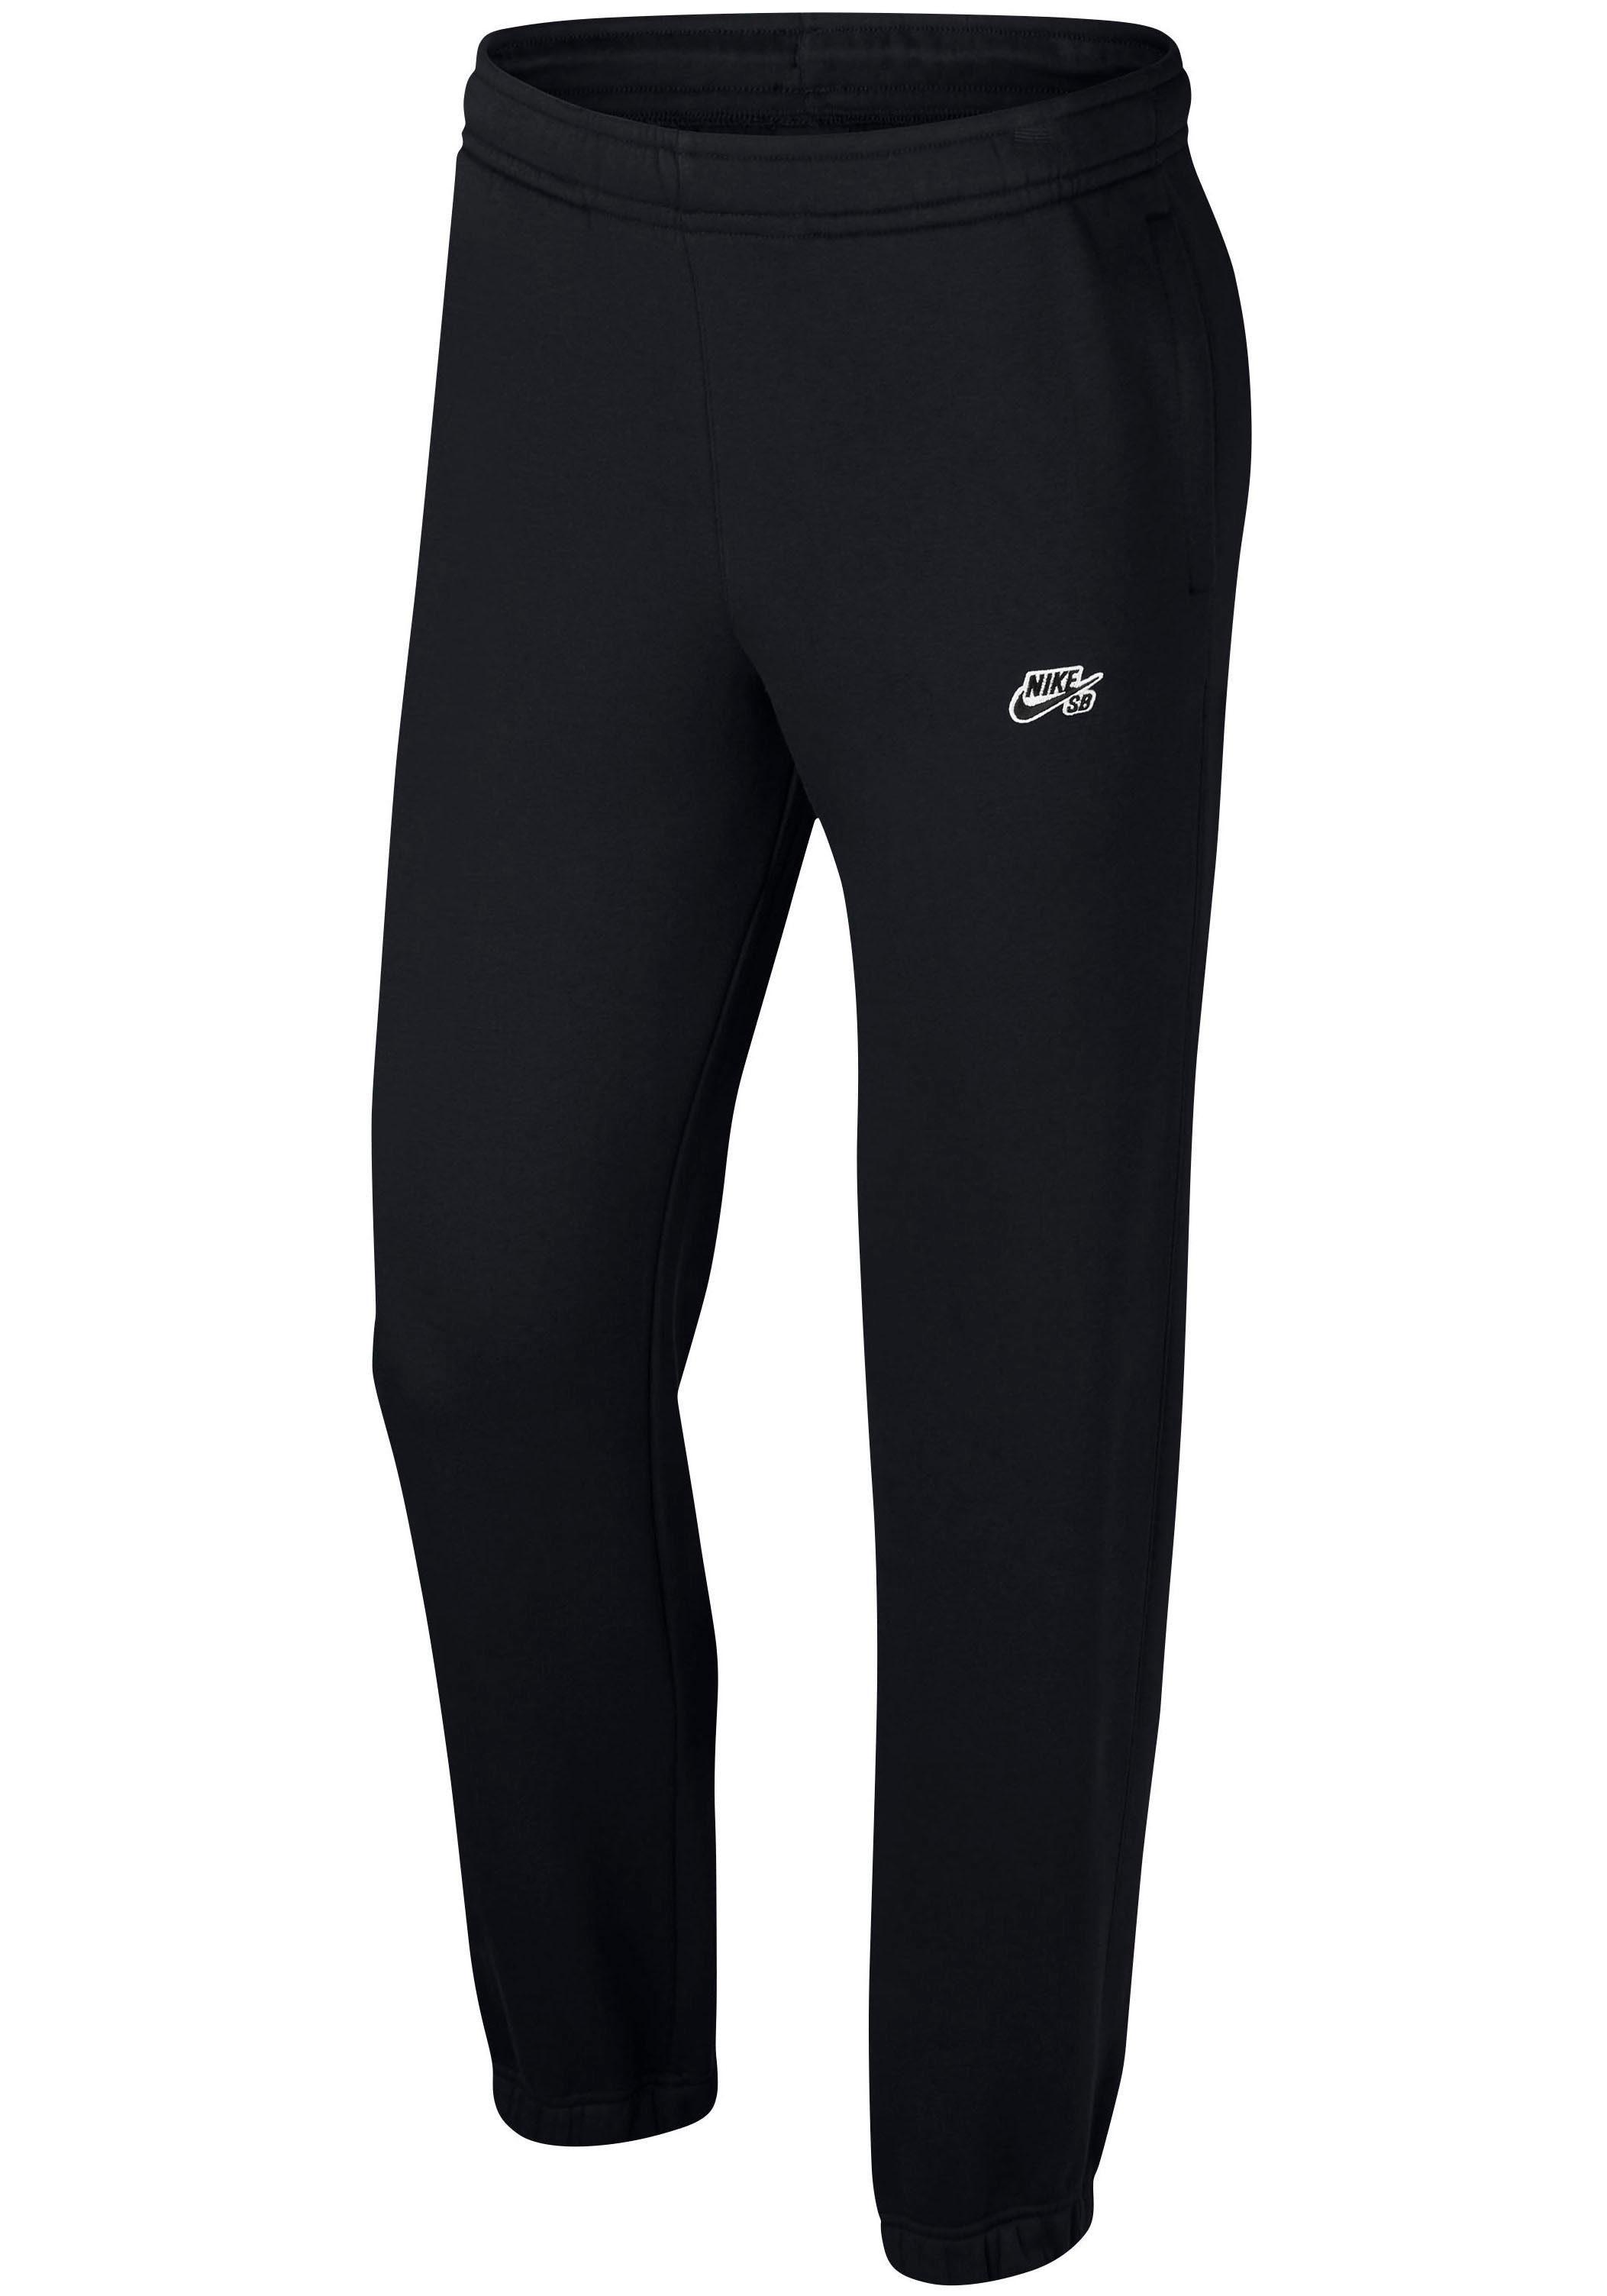 Nike SB Jogginghose »M NIKE SKATEBOARD PANT ICON FLEECE ESSENTIAL« online kaufen | OTTO